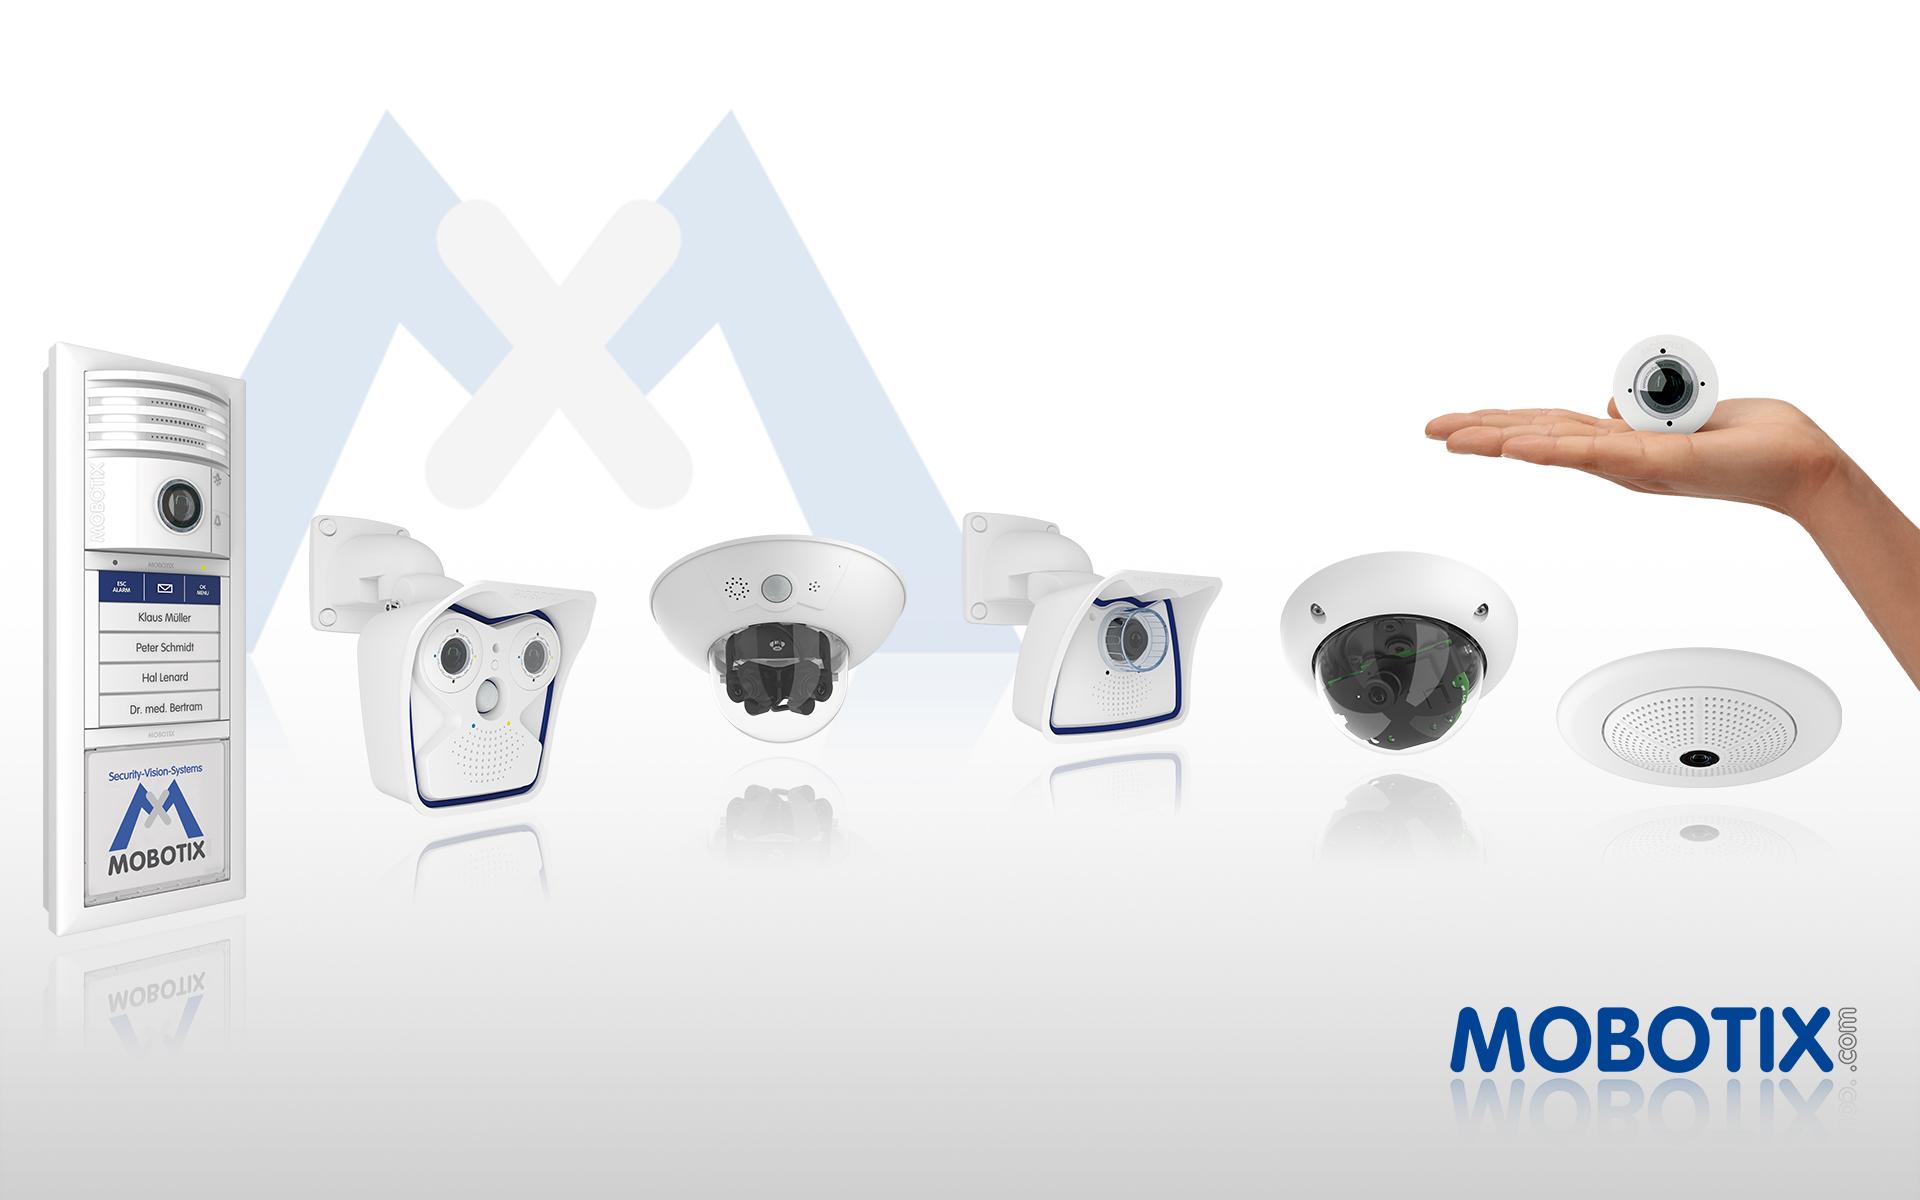 MOBOTIX Online-Shop